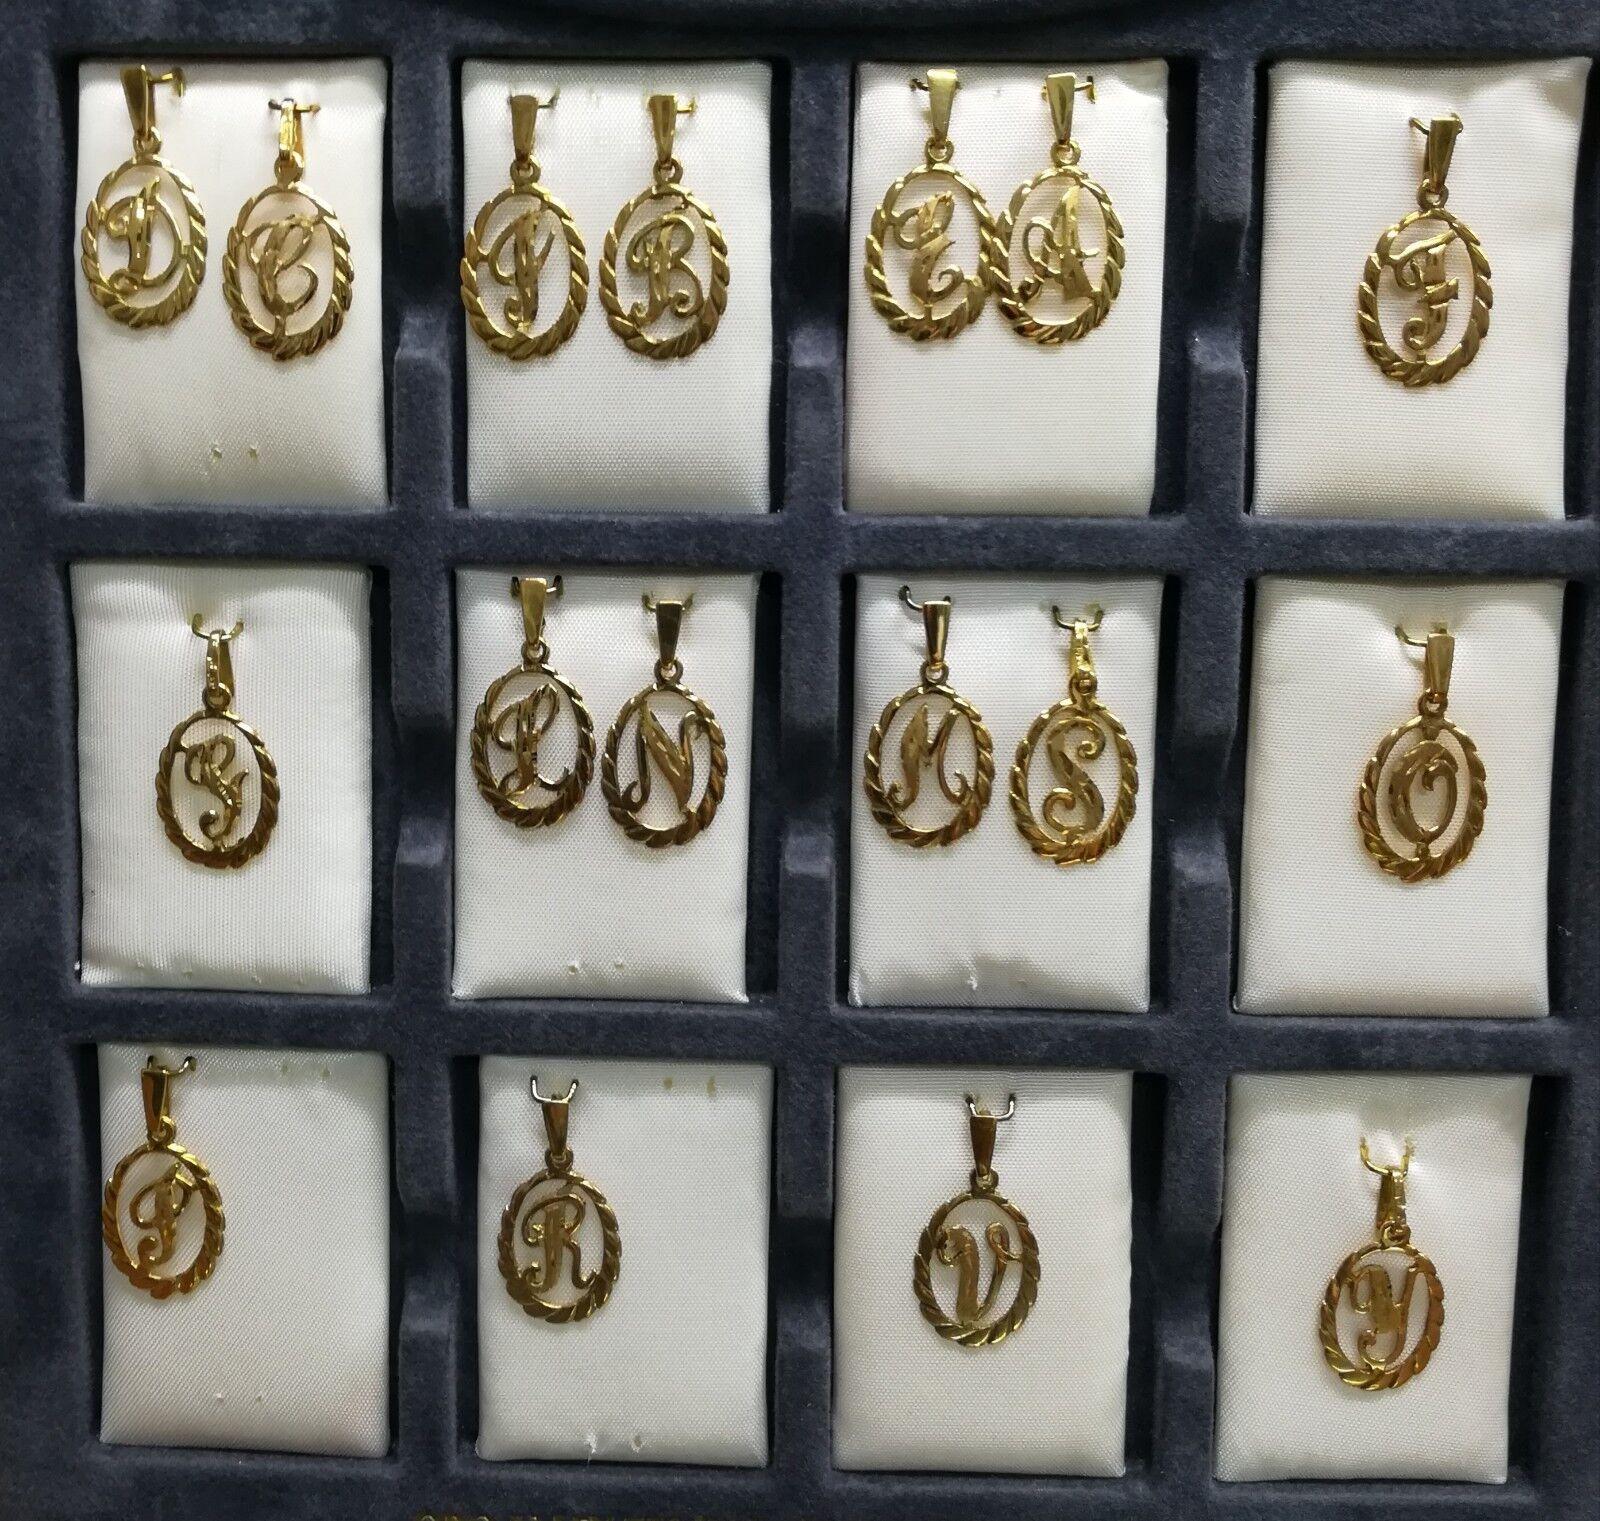 Colgante LETRA de gold 18 quilates. Disponibles A-B-C-J-E-D-F-S-L-N-M-O-P-R-V-Y-G